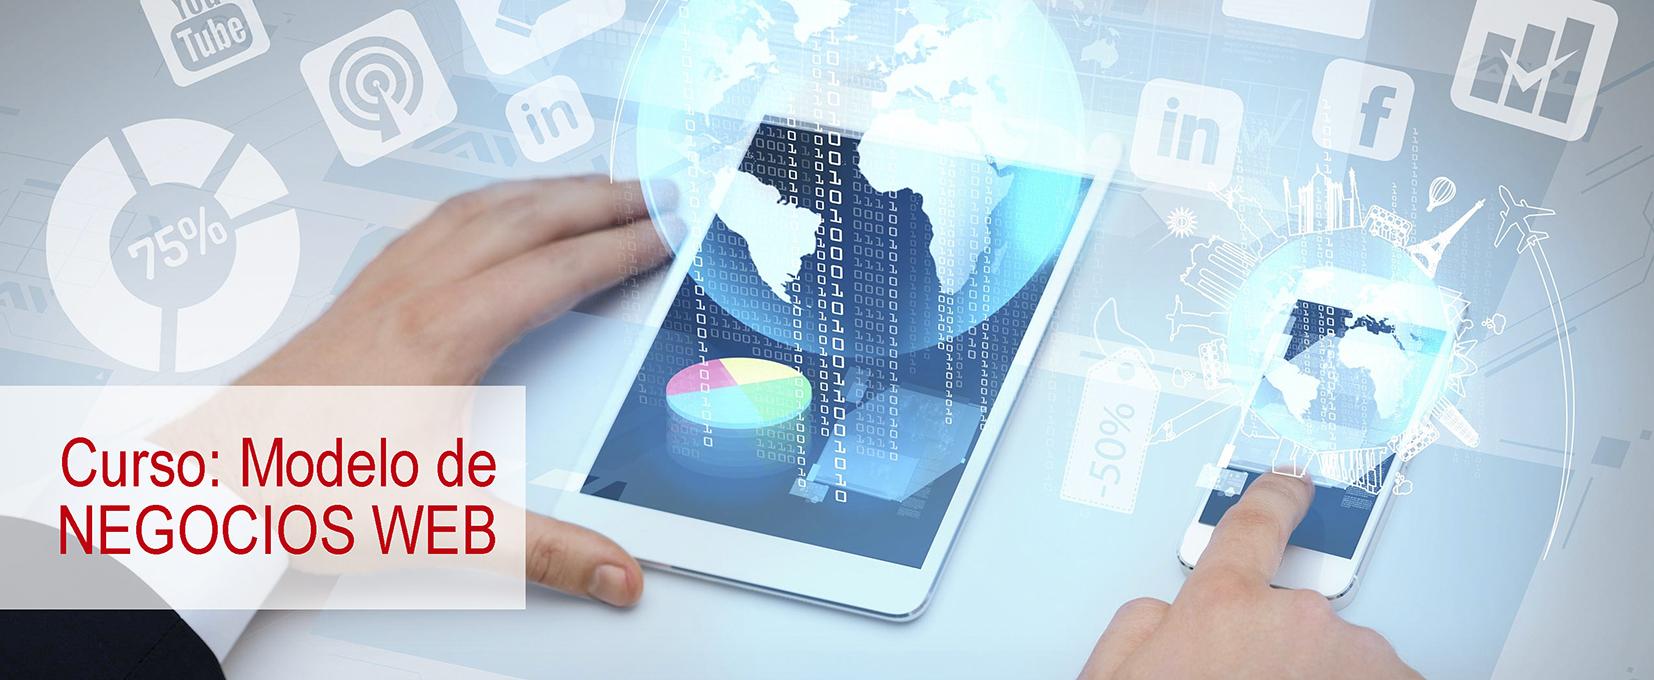 robotweb-Curso-negocios-web